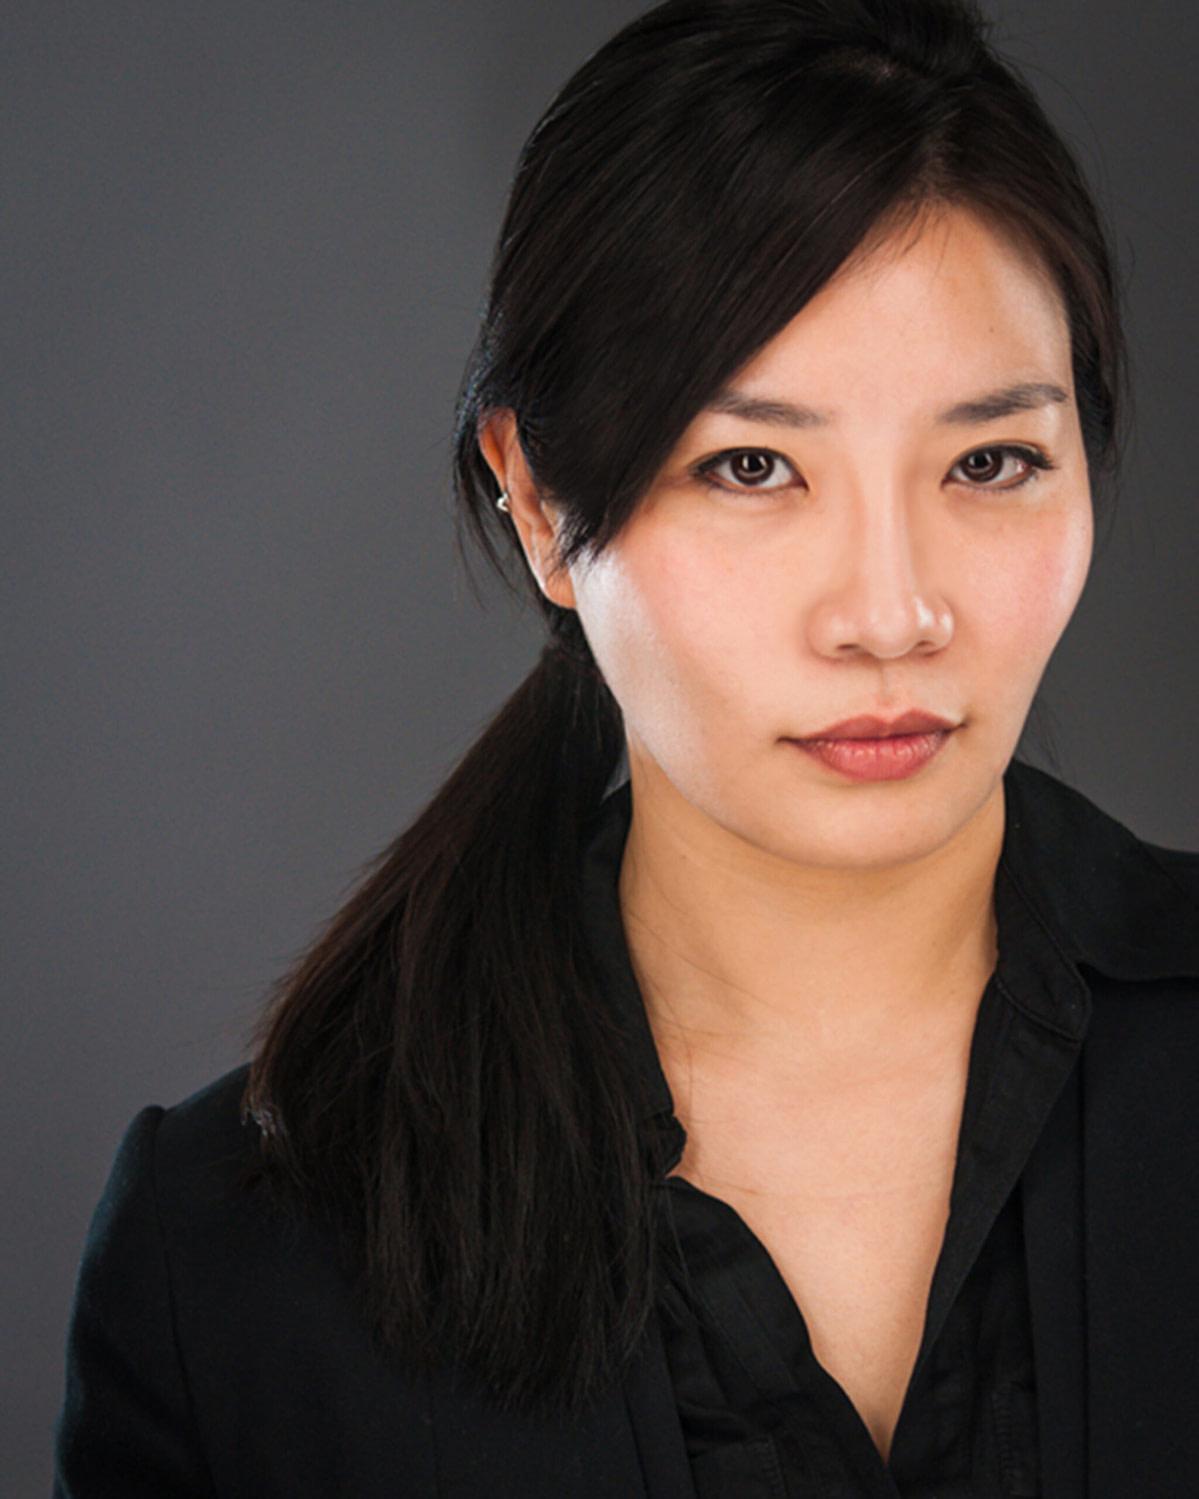 Vivian Ahn IMG 6578 scaled